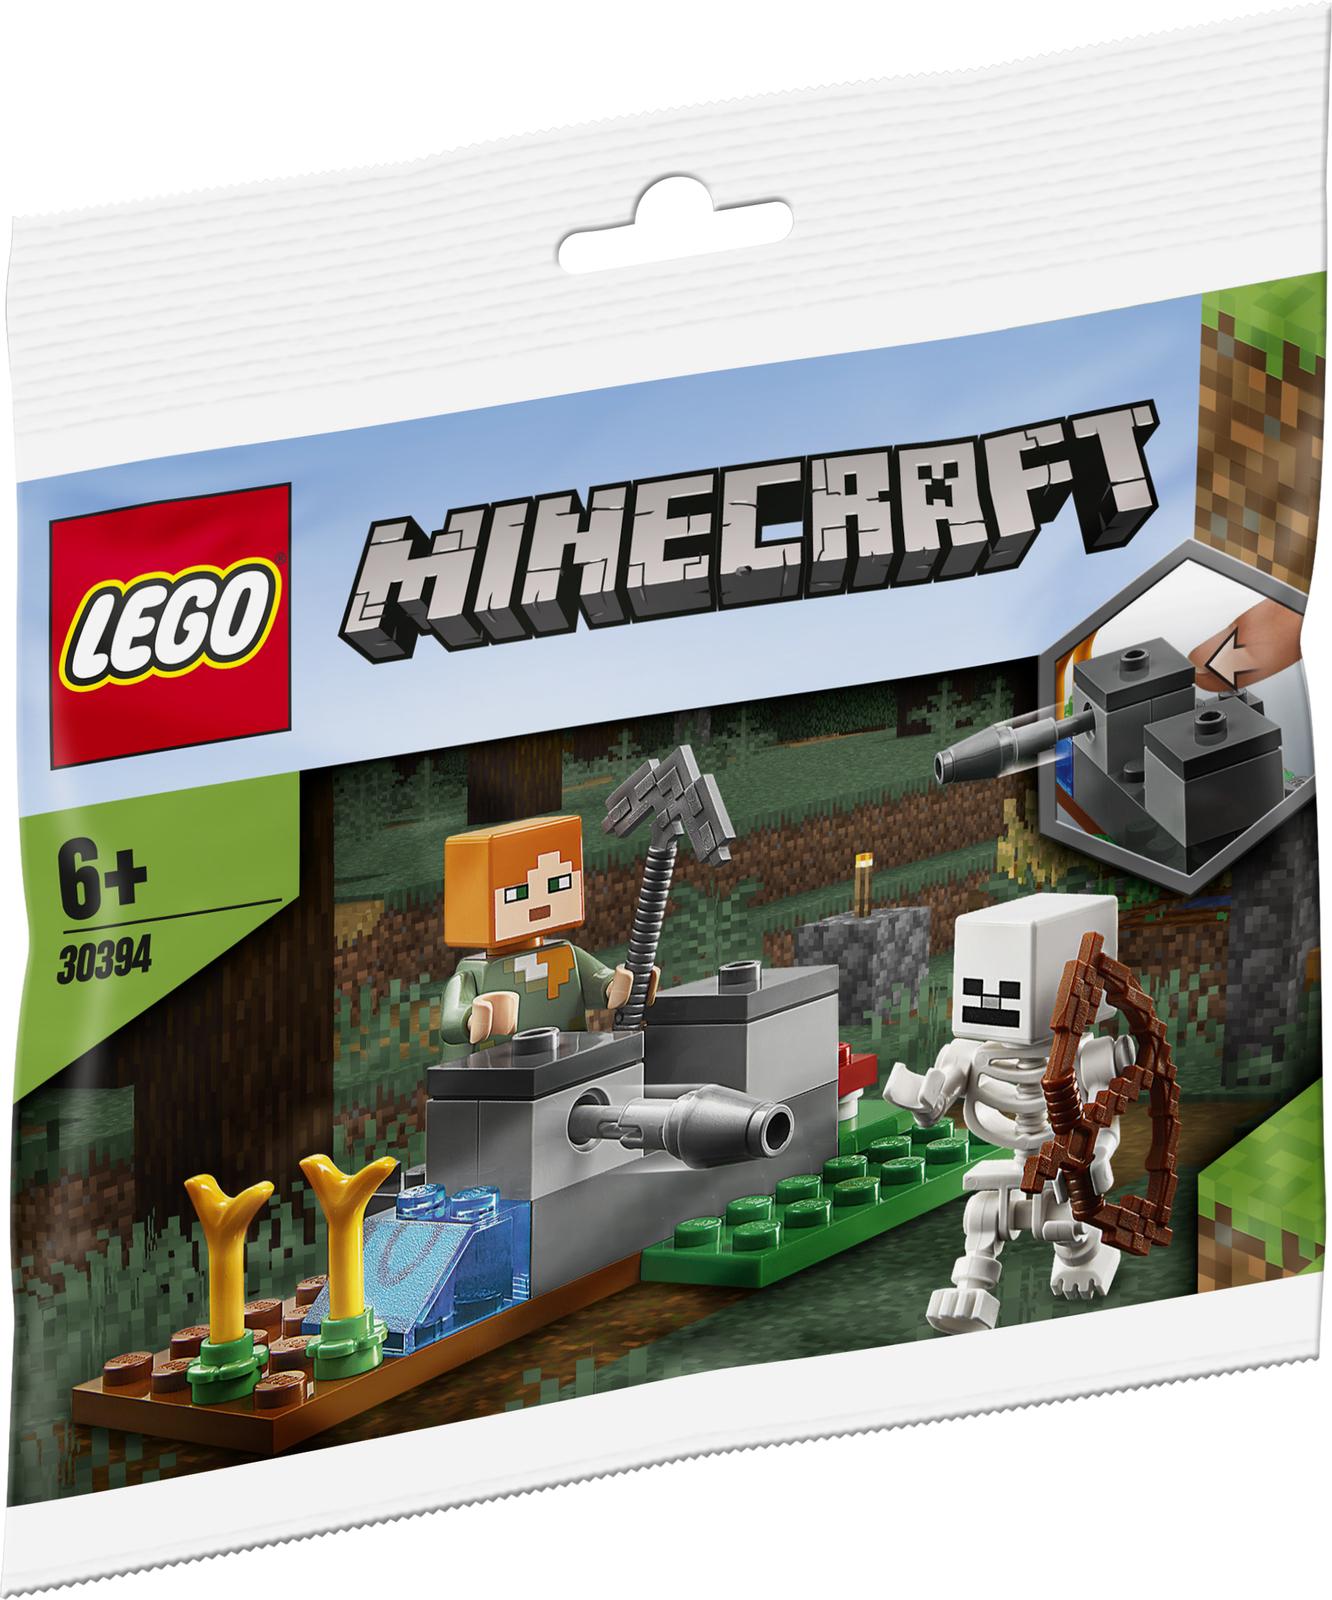 Lego: Minecraft - The Skeleton Defense image